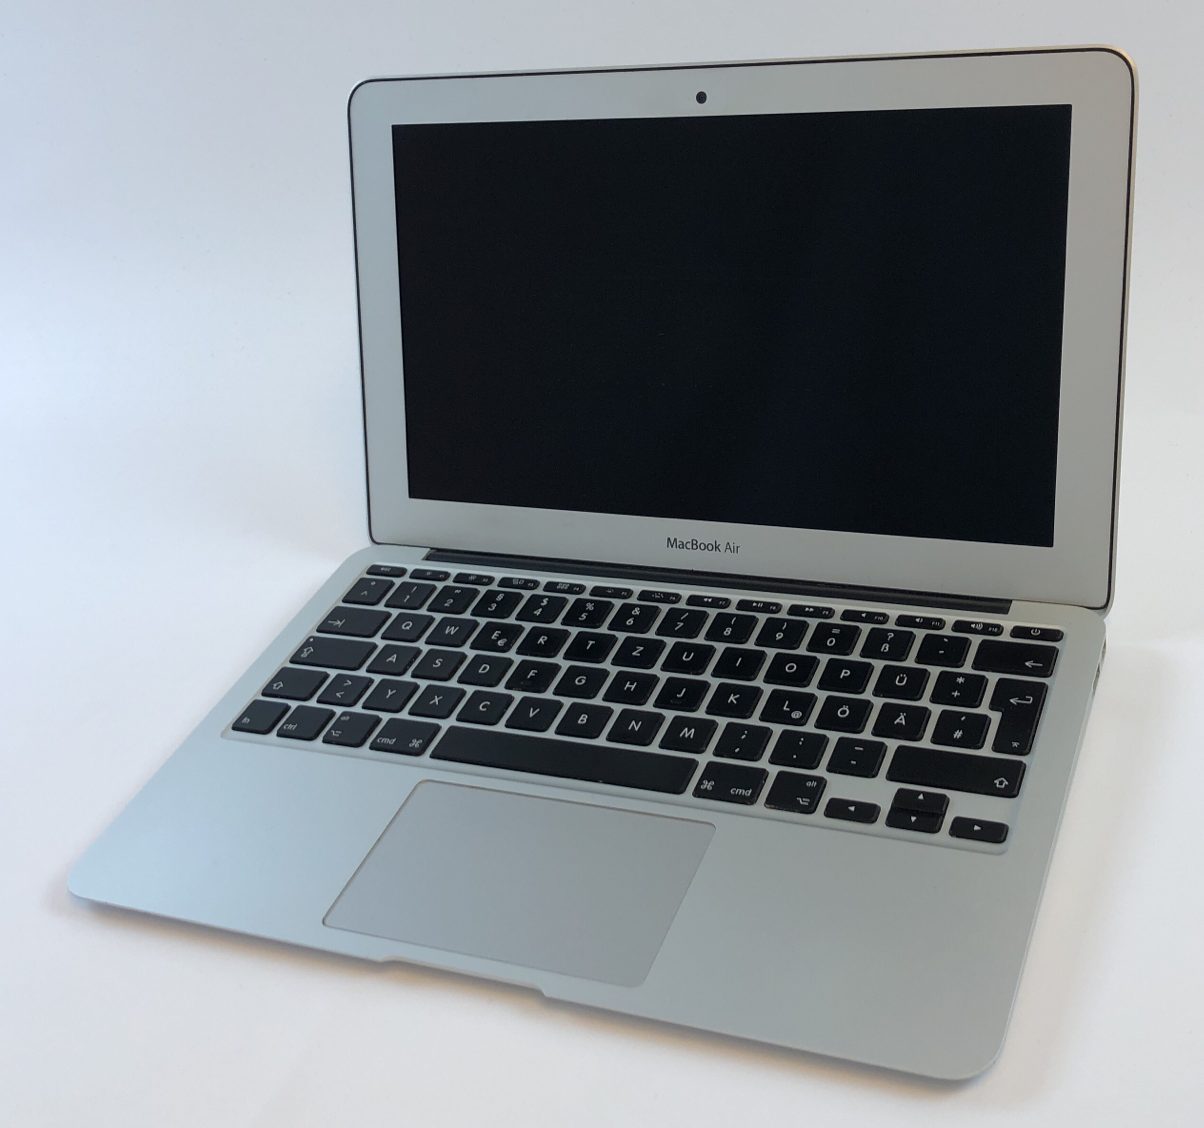 "MacBook Air 11"" Early 2014 (Intel Core i7 1.7 GHz 8 GB RAM 512 GB SSD), Intel Core i7 1.7 GHz, 8 GB RAM, 512 GB SSD, Bild 1"